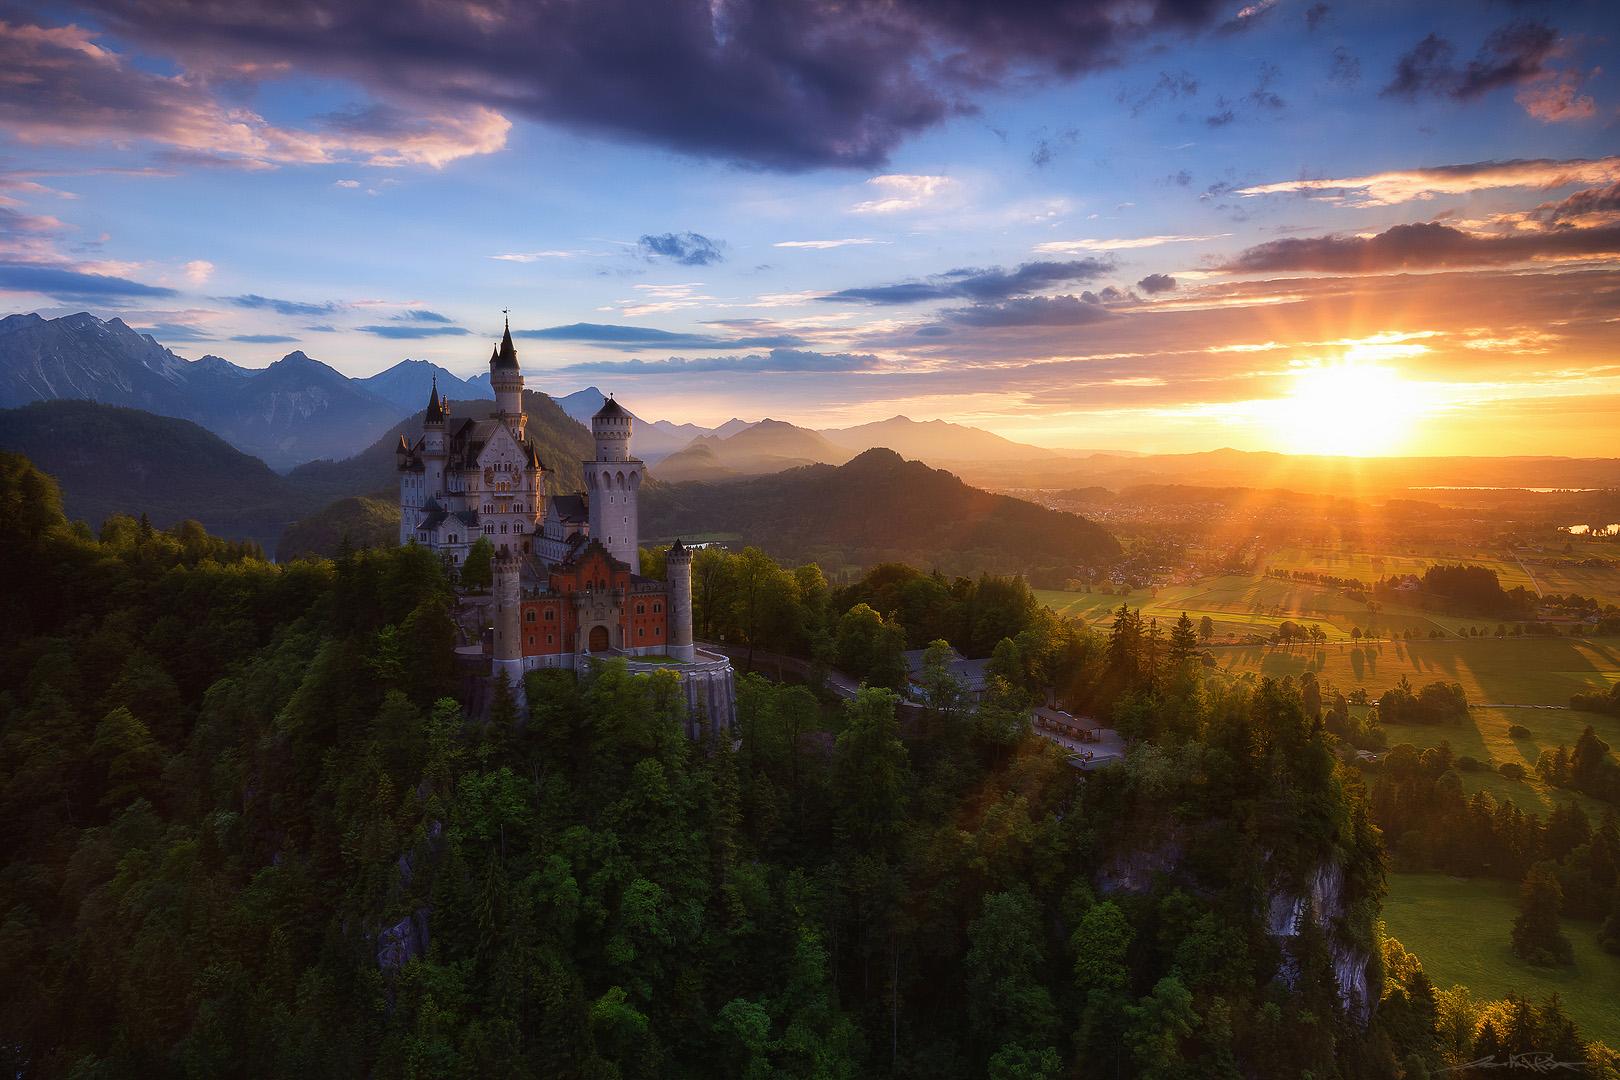 . : castle in the sky : .